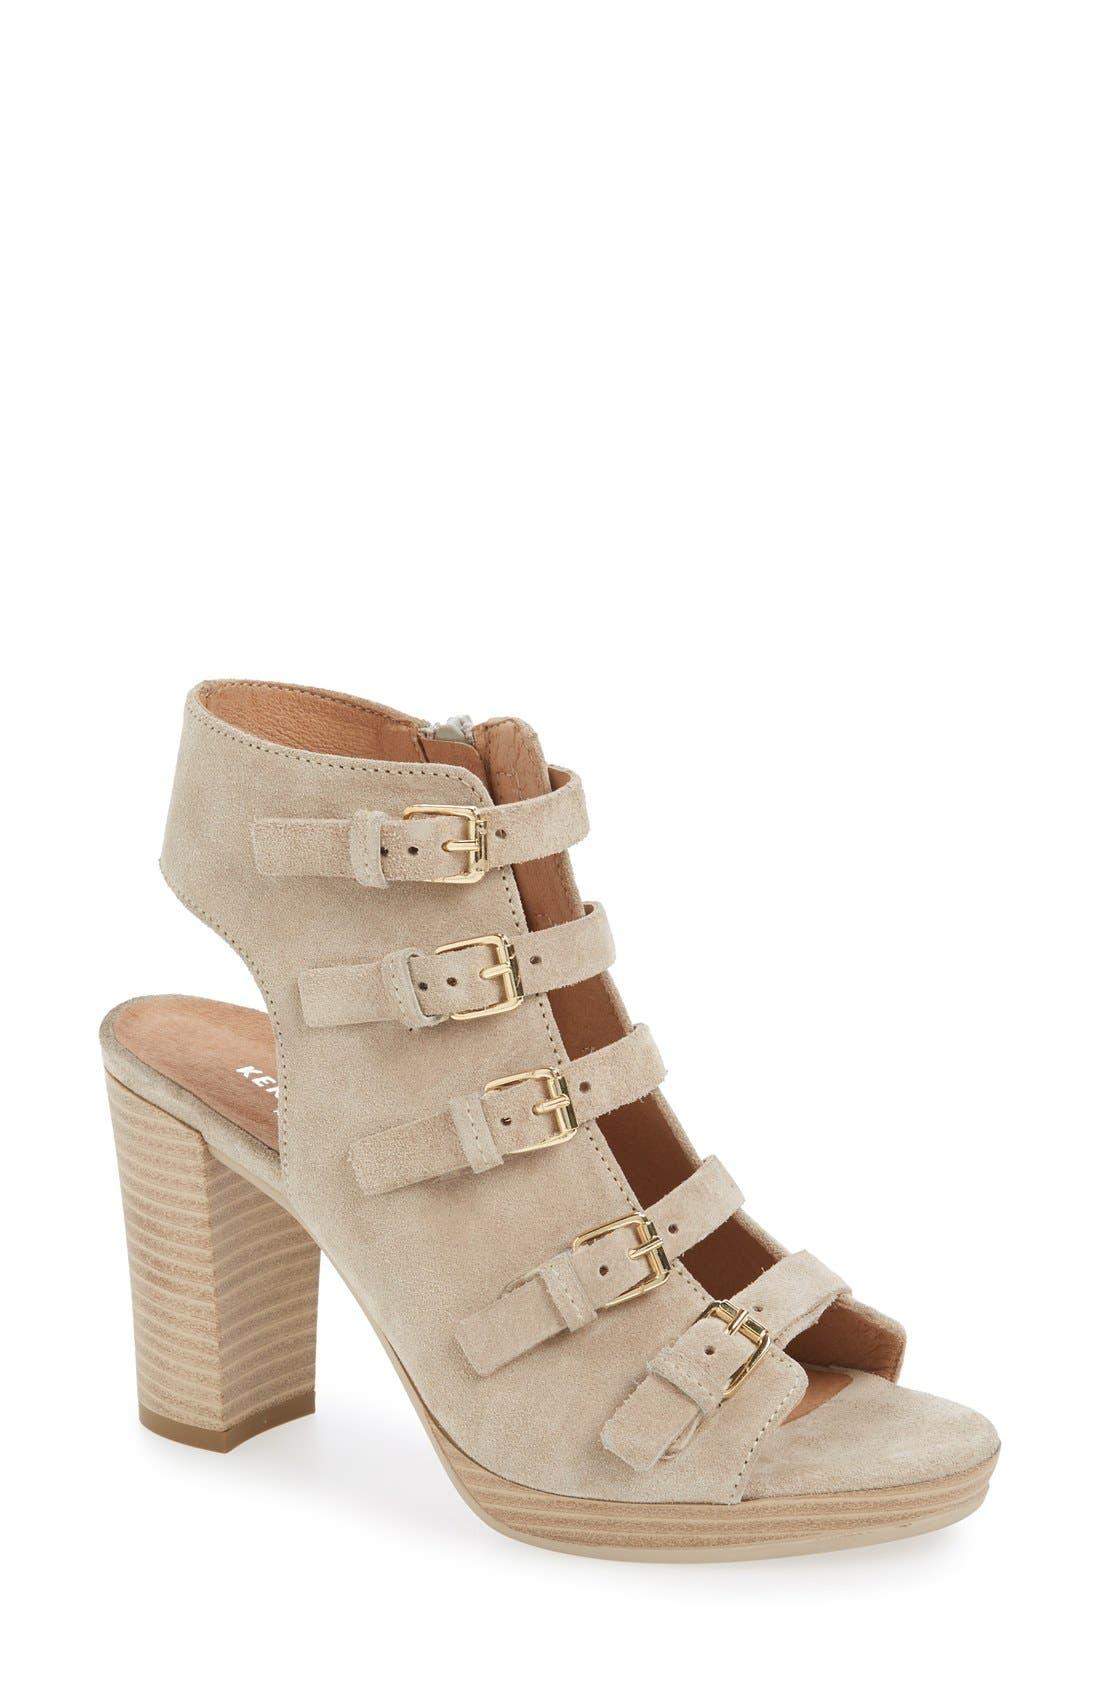 Alternate Image 1 Selected - Kenneth Cole New York 'Kennedy' Buckle Strap Block Heel Sandal (Women)